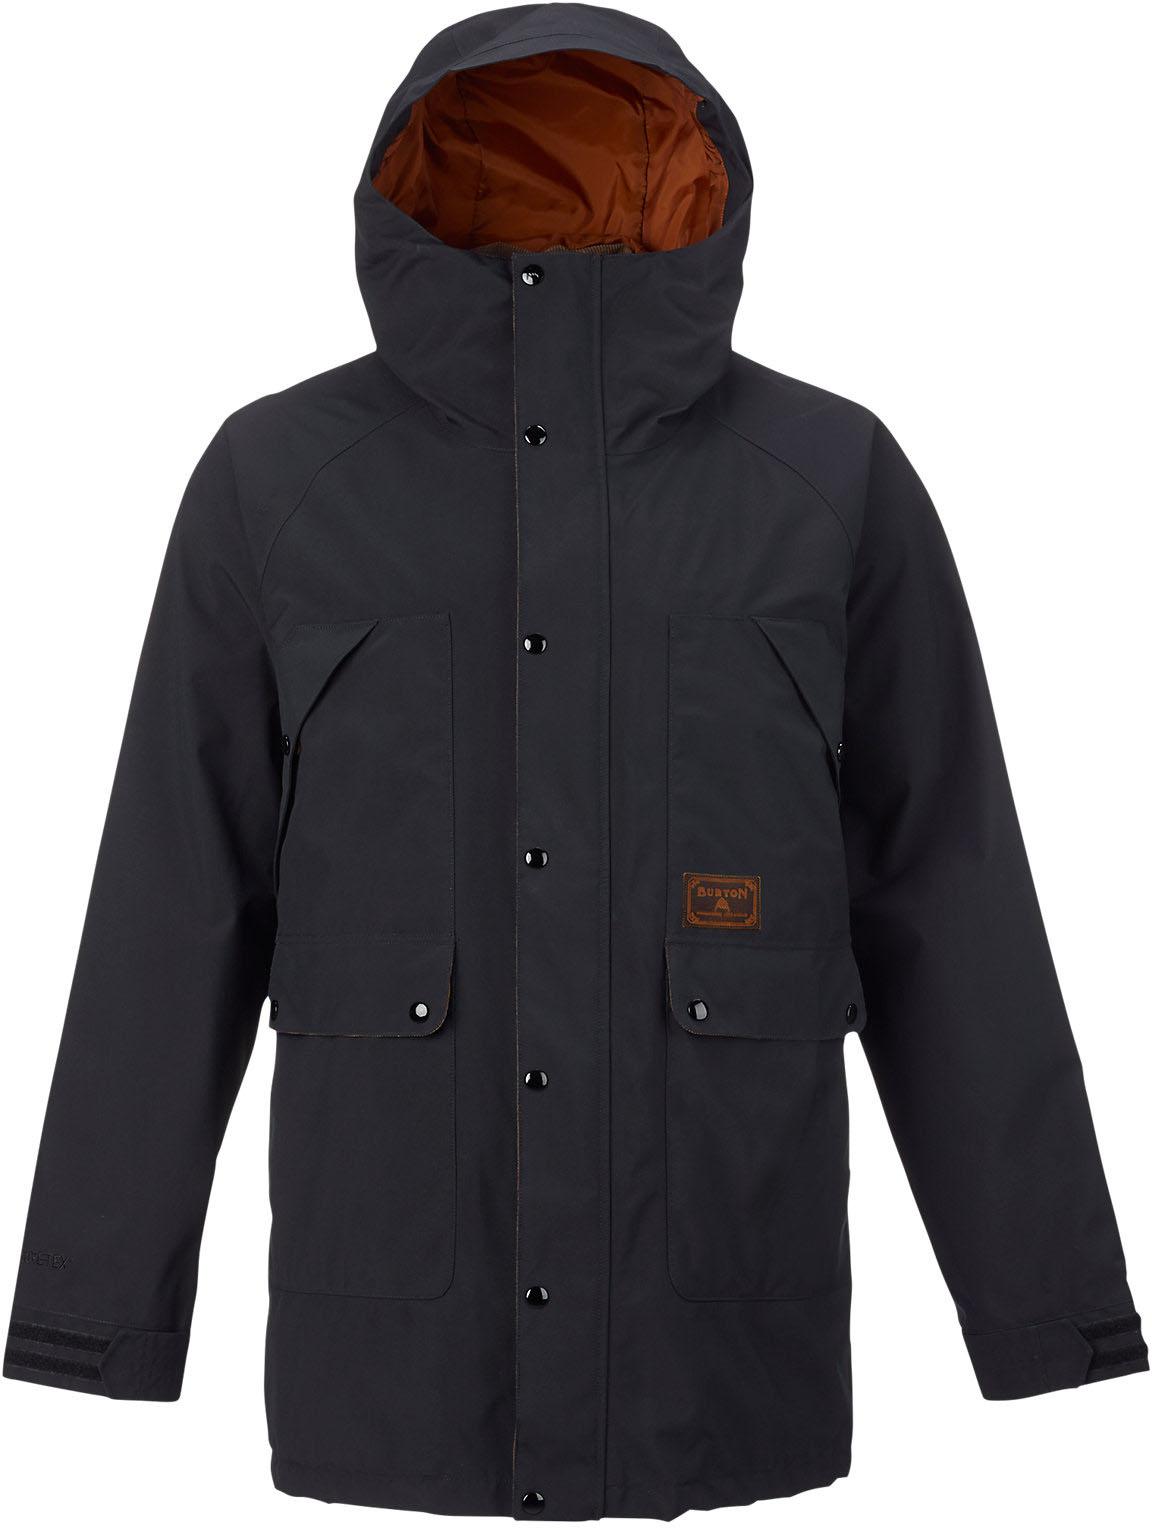 image burton-vagabond-gore-tex-snowboard-jacket-true-black-17-jpg